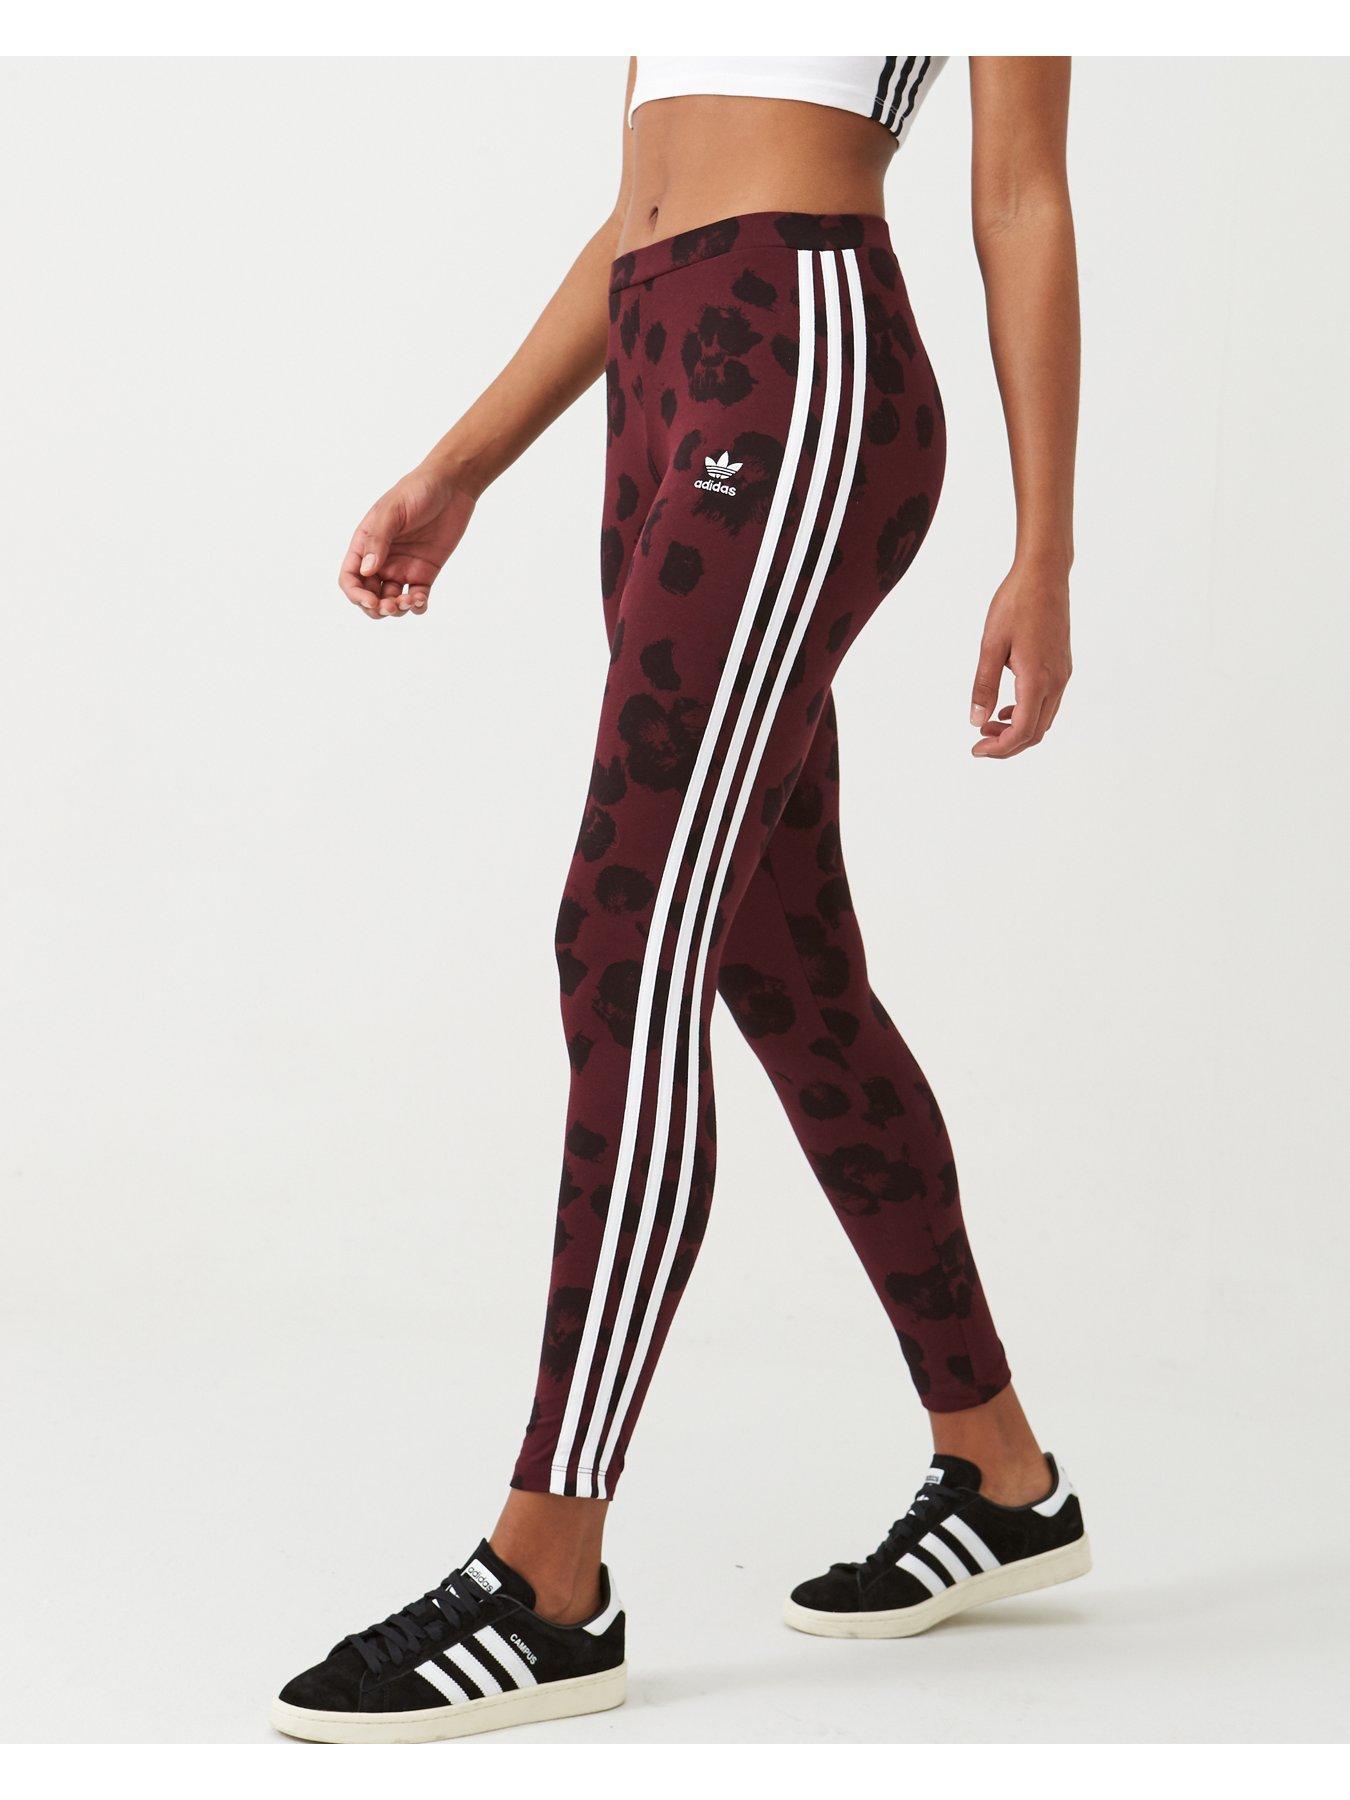 Adidas | Trousers & leggings | Women | very.co.uk